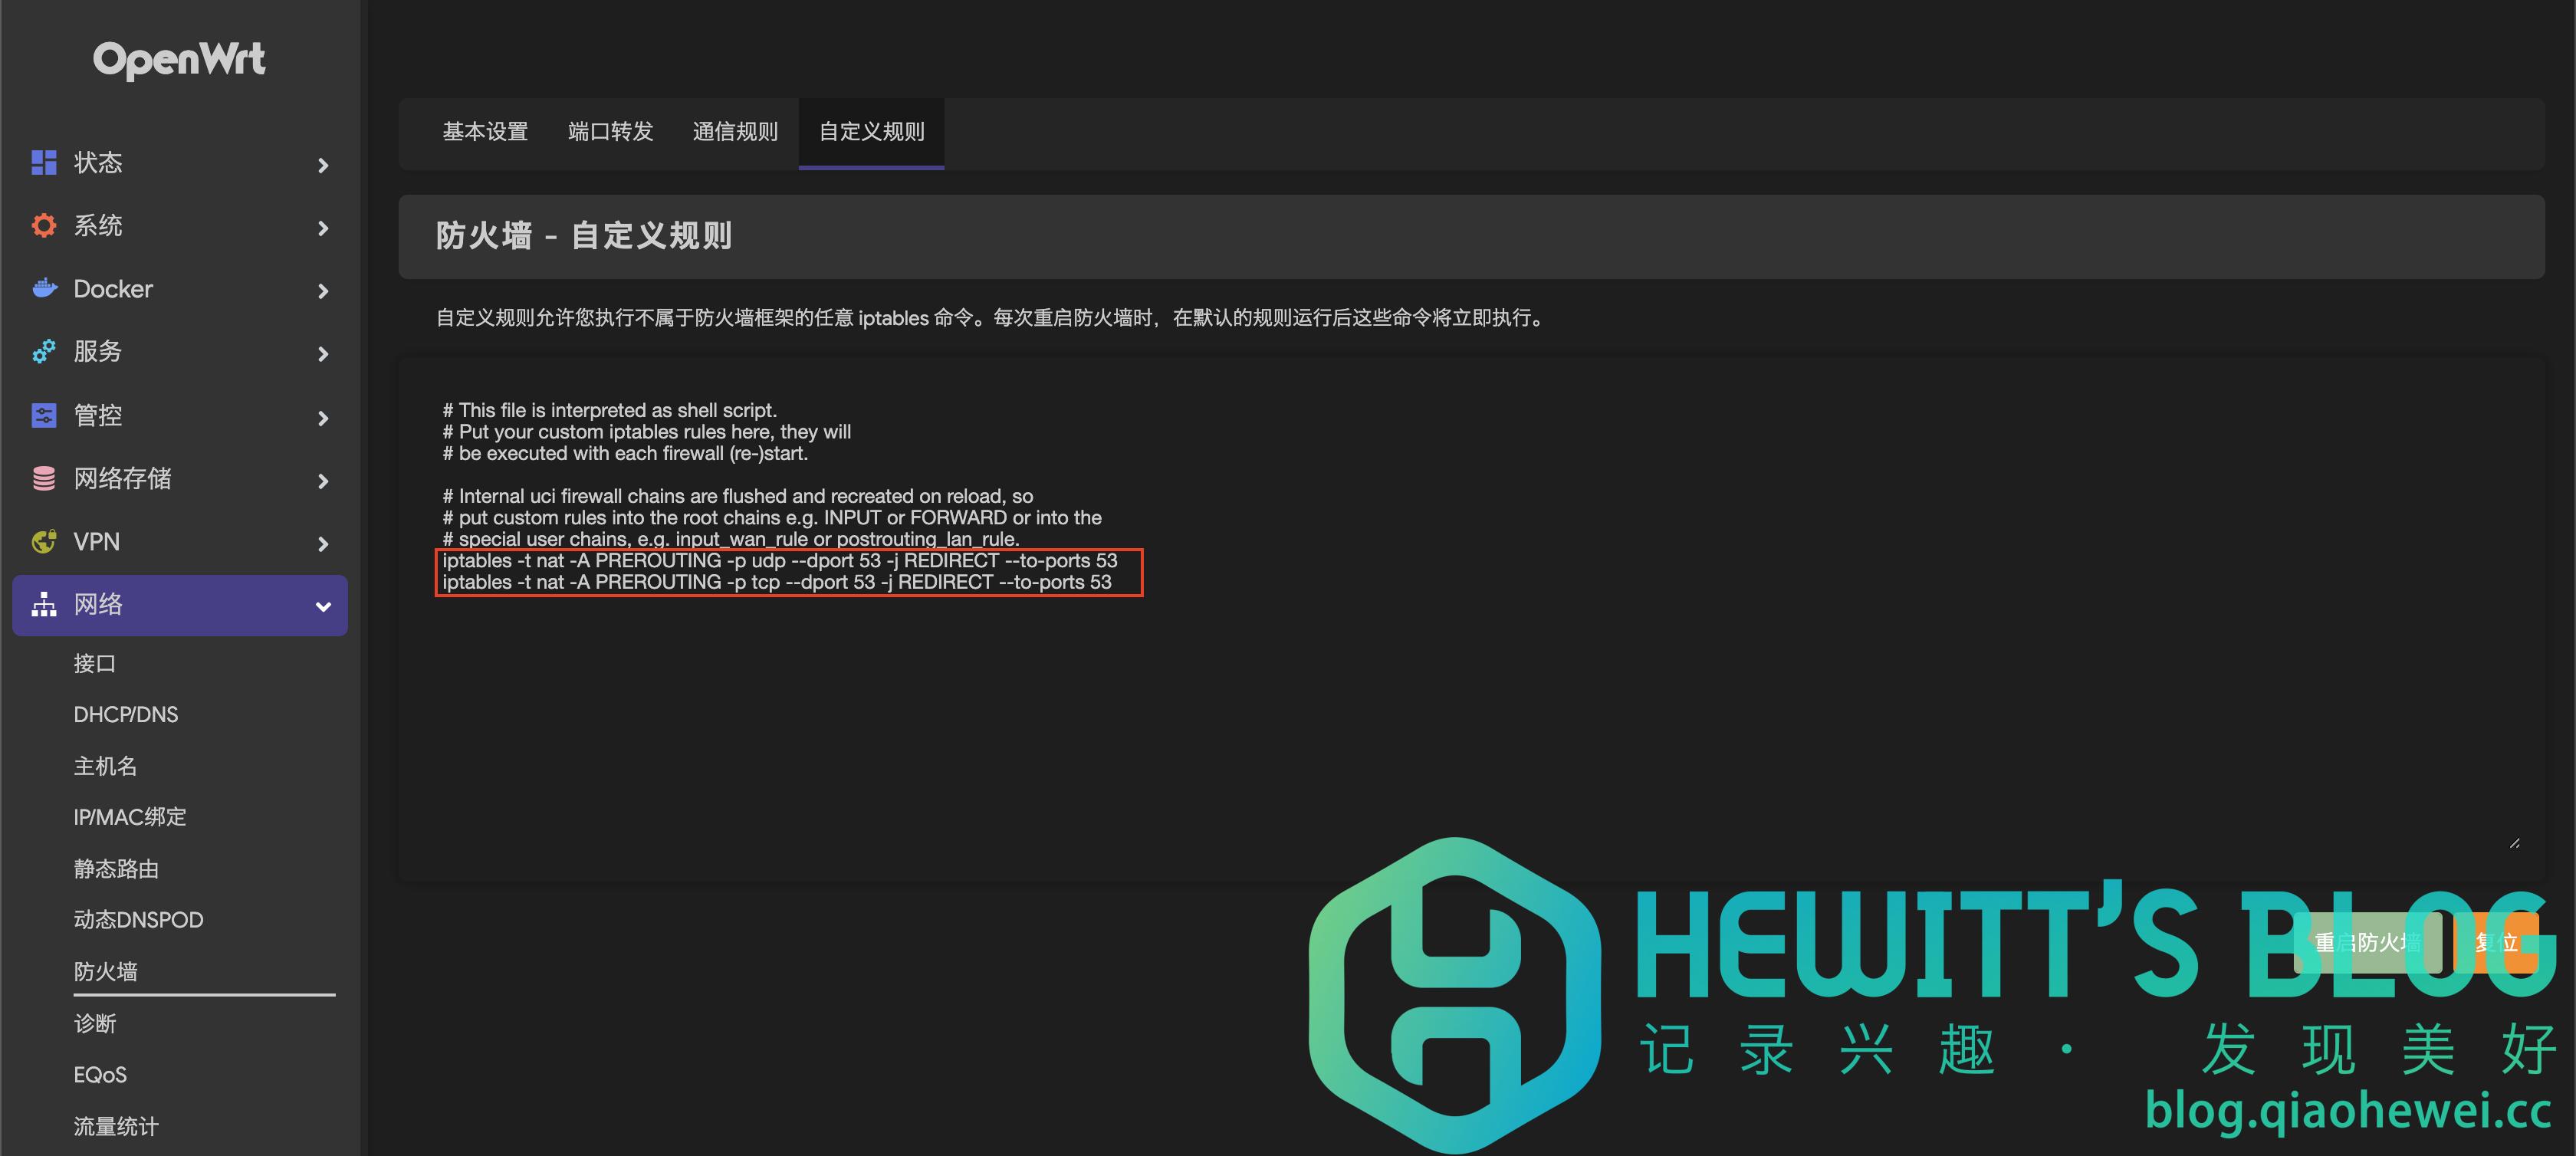 Adguardhome客户端IP显示异常处理插图3